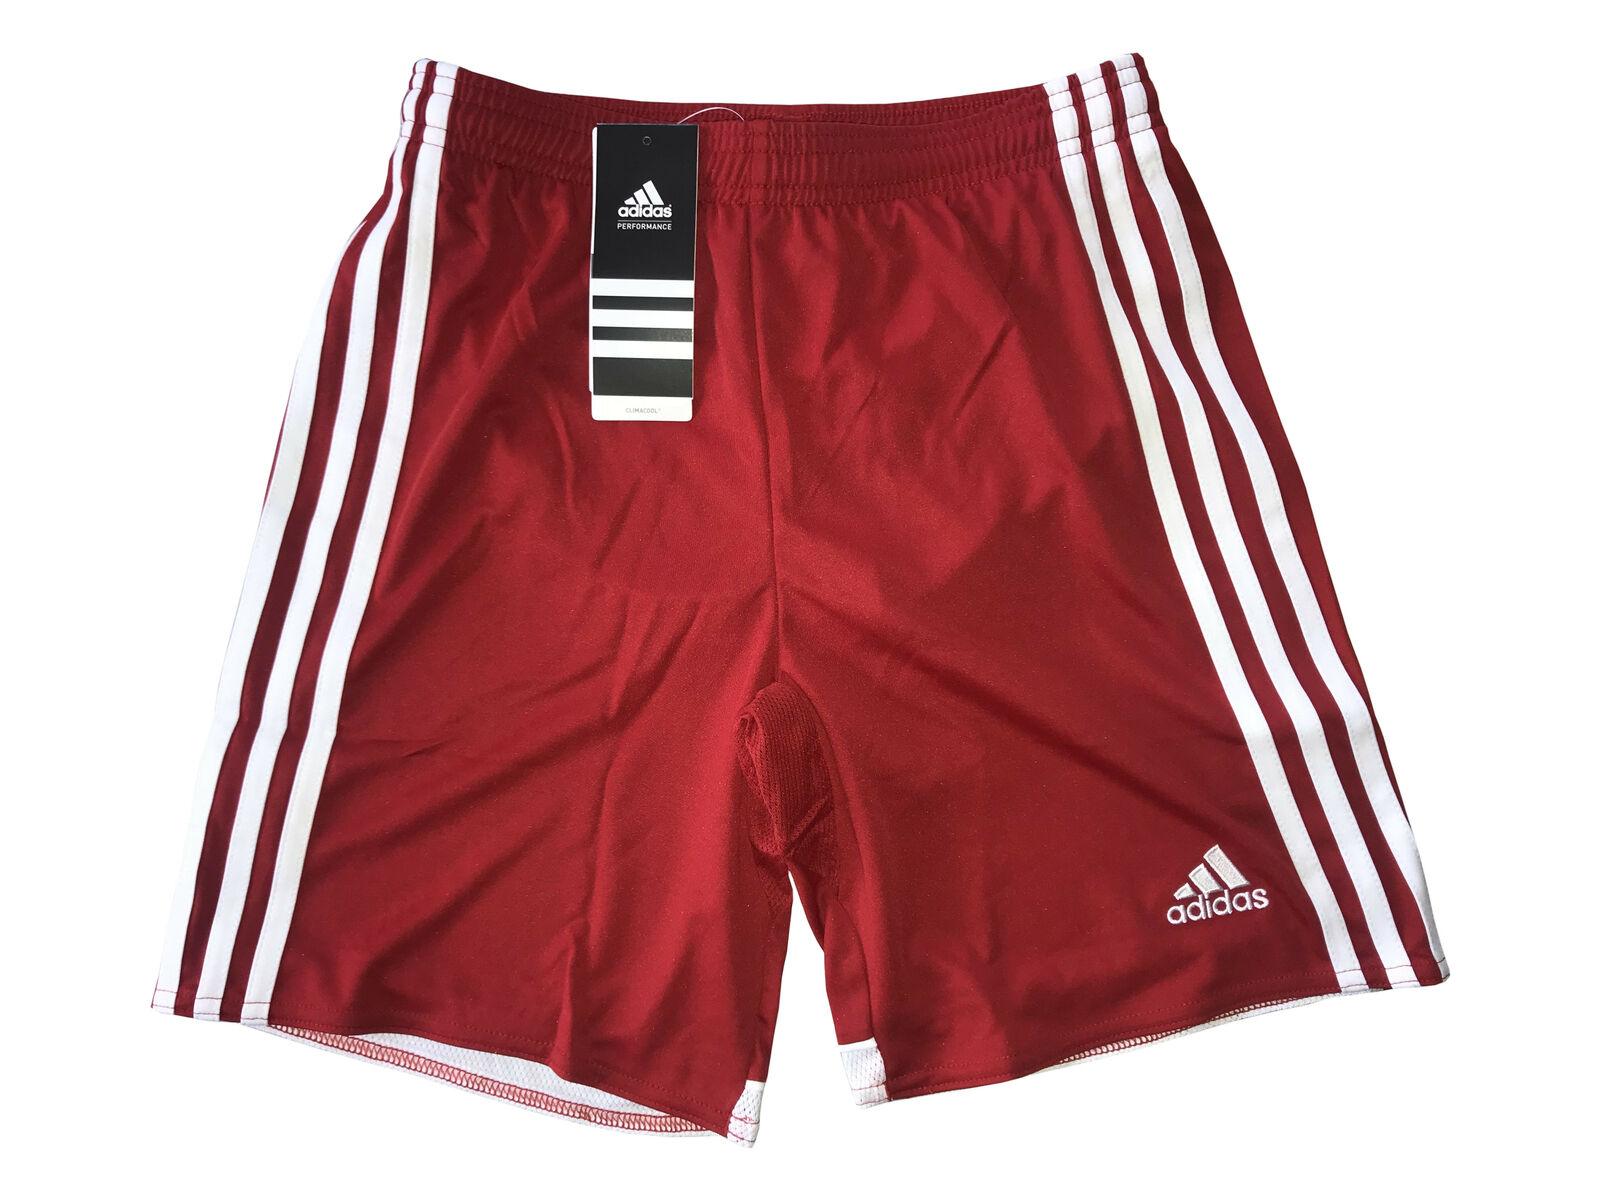 adidas Kinder Shorts Gr. 164 kurze Hose Trainingshose Sporthose Training Fußball